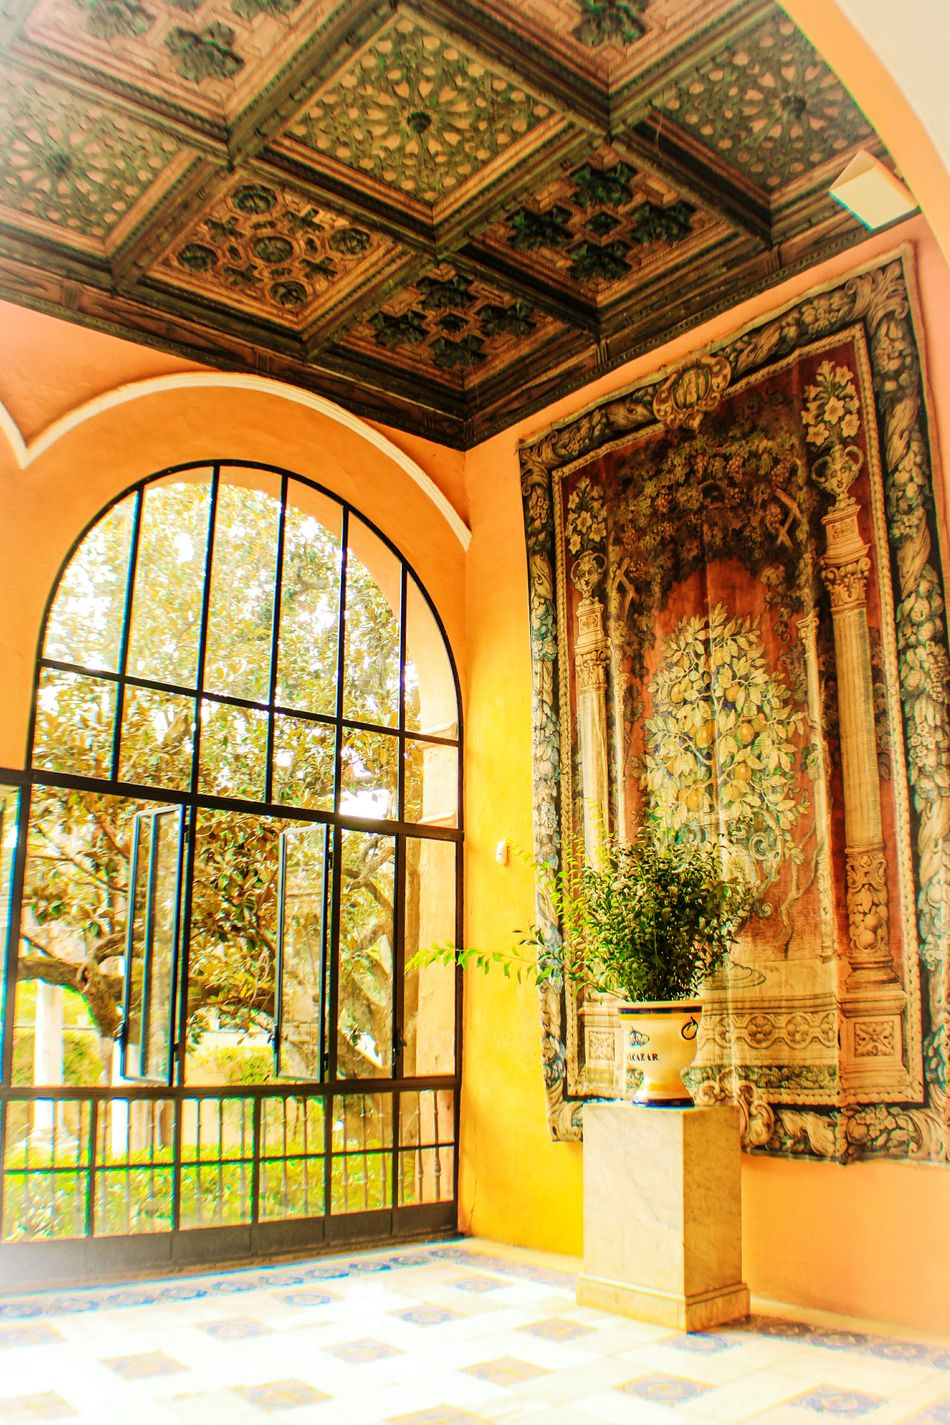 Architecture Indoors  Window Arch Ceiling Flooring Arched Sevilla Sevilla, España Seville,spain Realesalcazares Real Alcazar De Sevilla Tapiz Jarron EyeEm Gallery Travel Travel Destinations Interior Design Check This Out